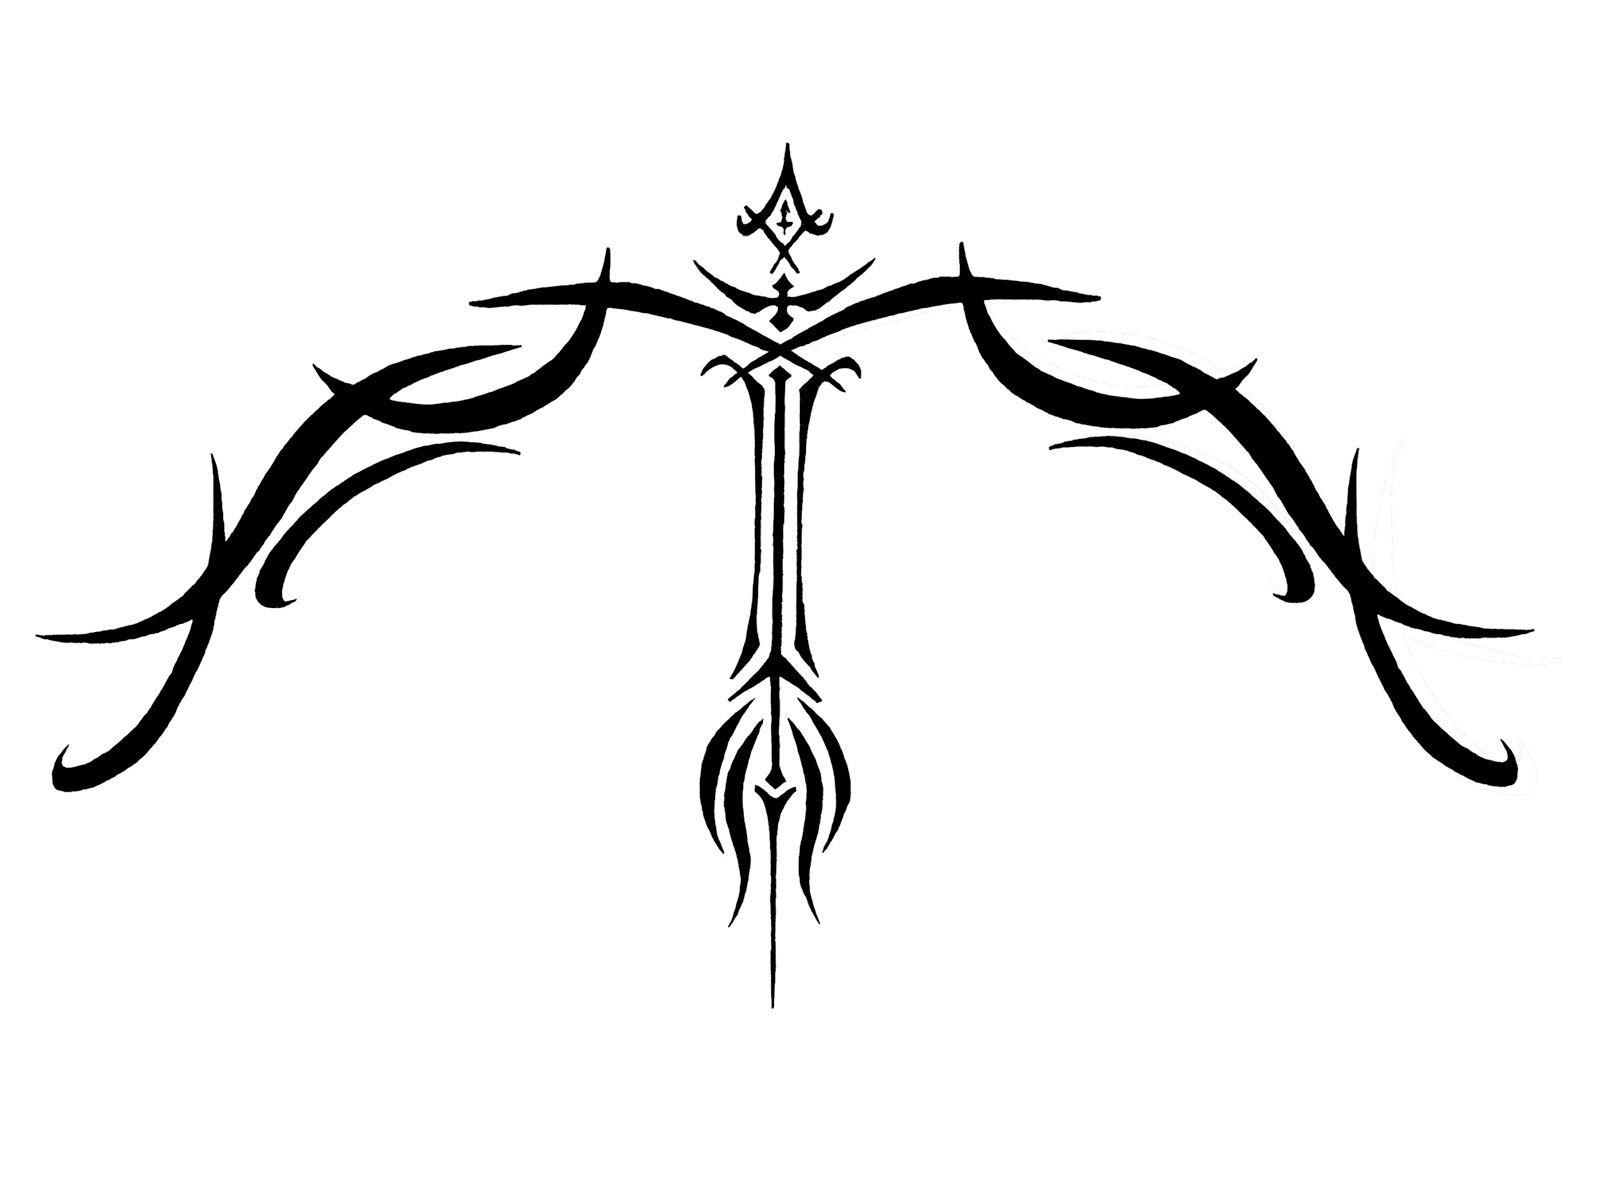 zodiac tattoos sagittarius free designs zodiac sagittarius tattoo wallpaper tattoo ideas. Black Bedroom Furniture Sets. Home Design Ideas